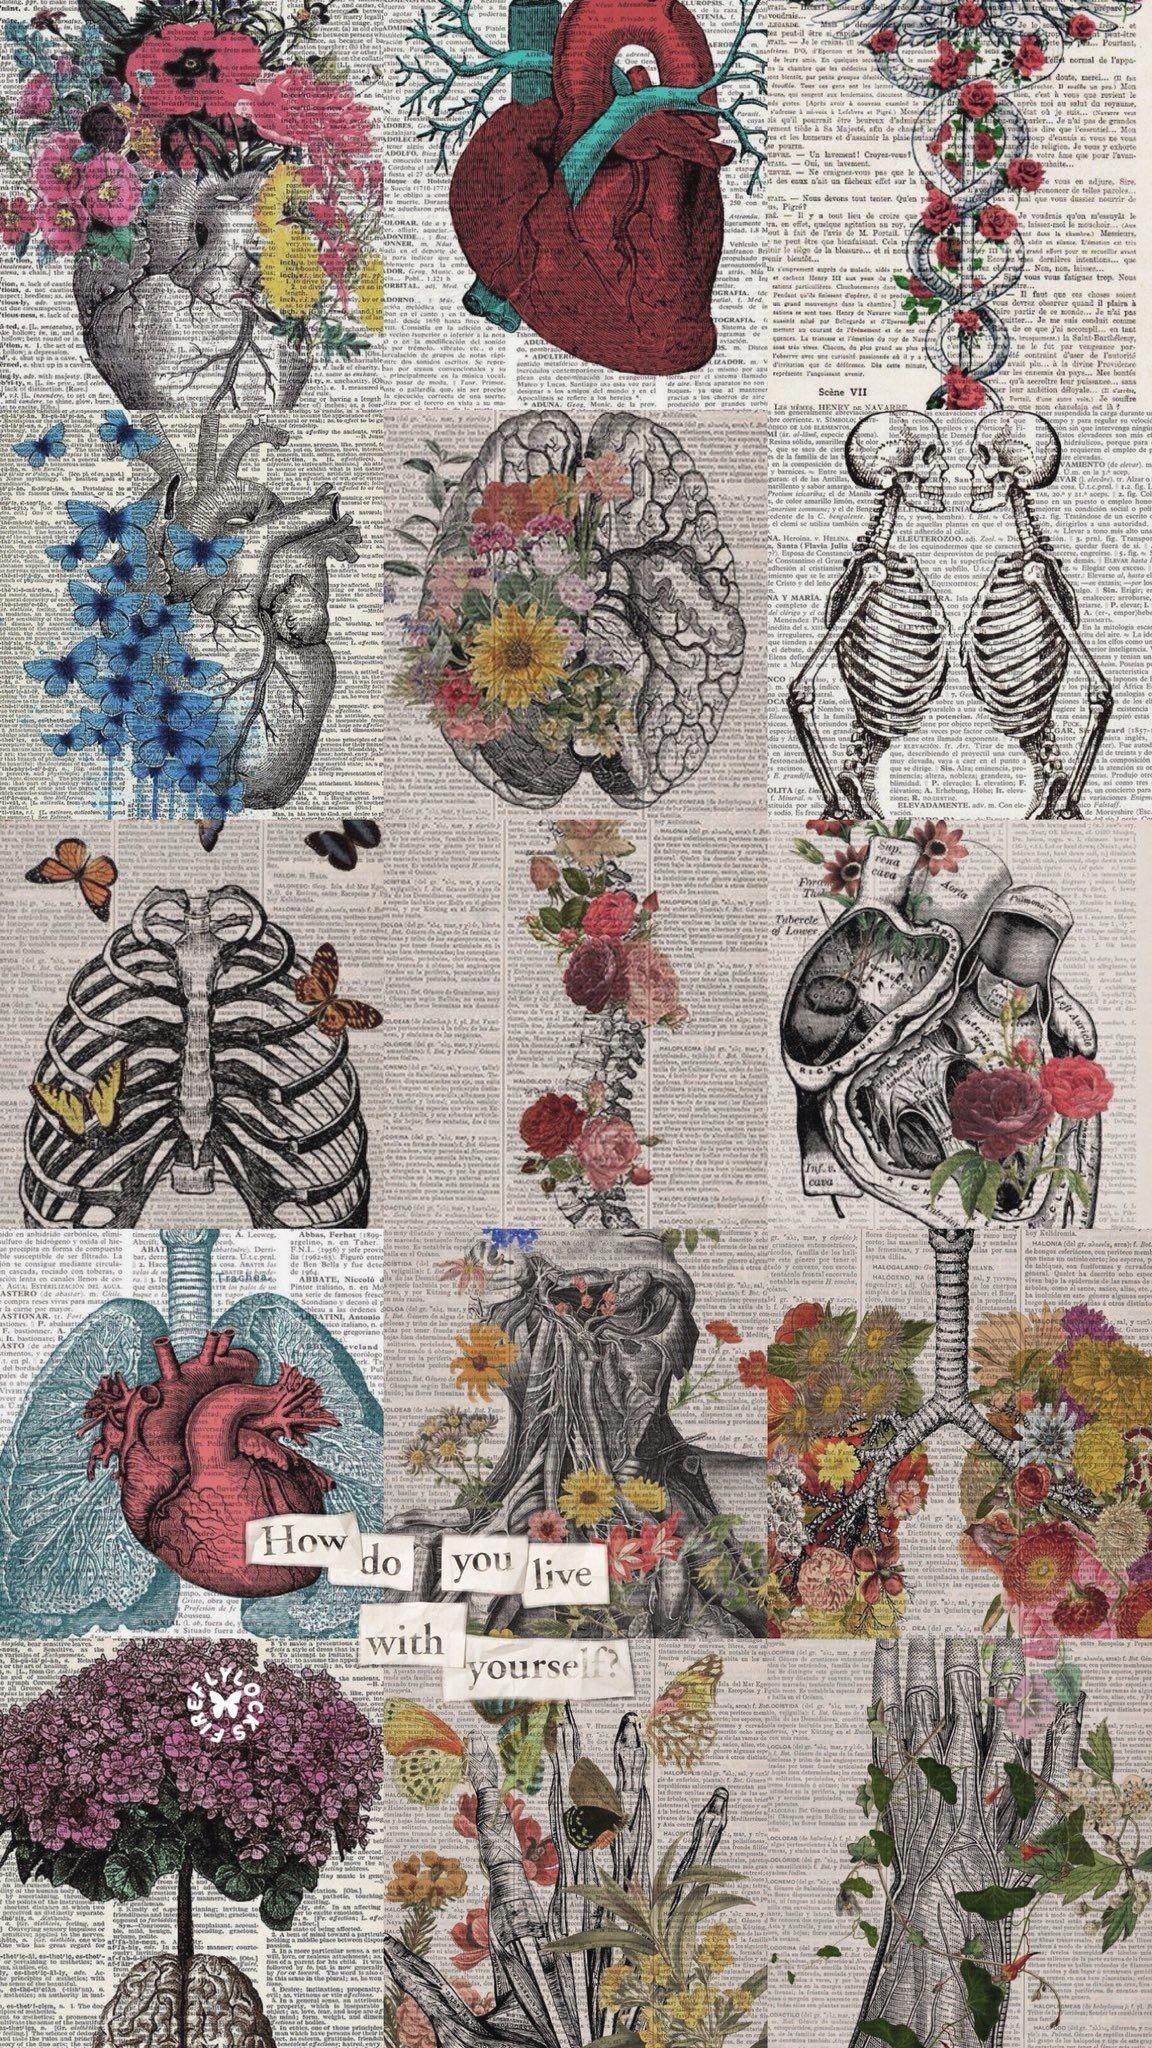 Iphonepics Smartphone Photography In 2019 Art Collage Anatomy Art